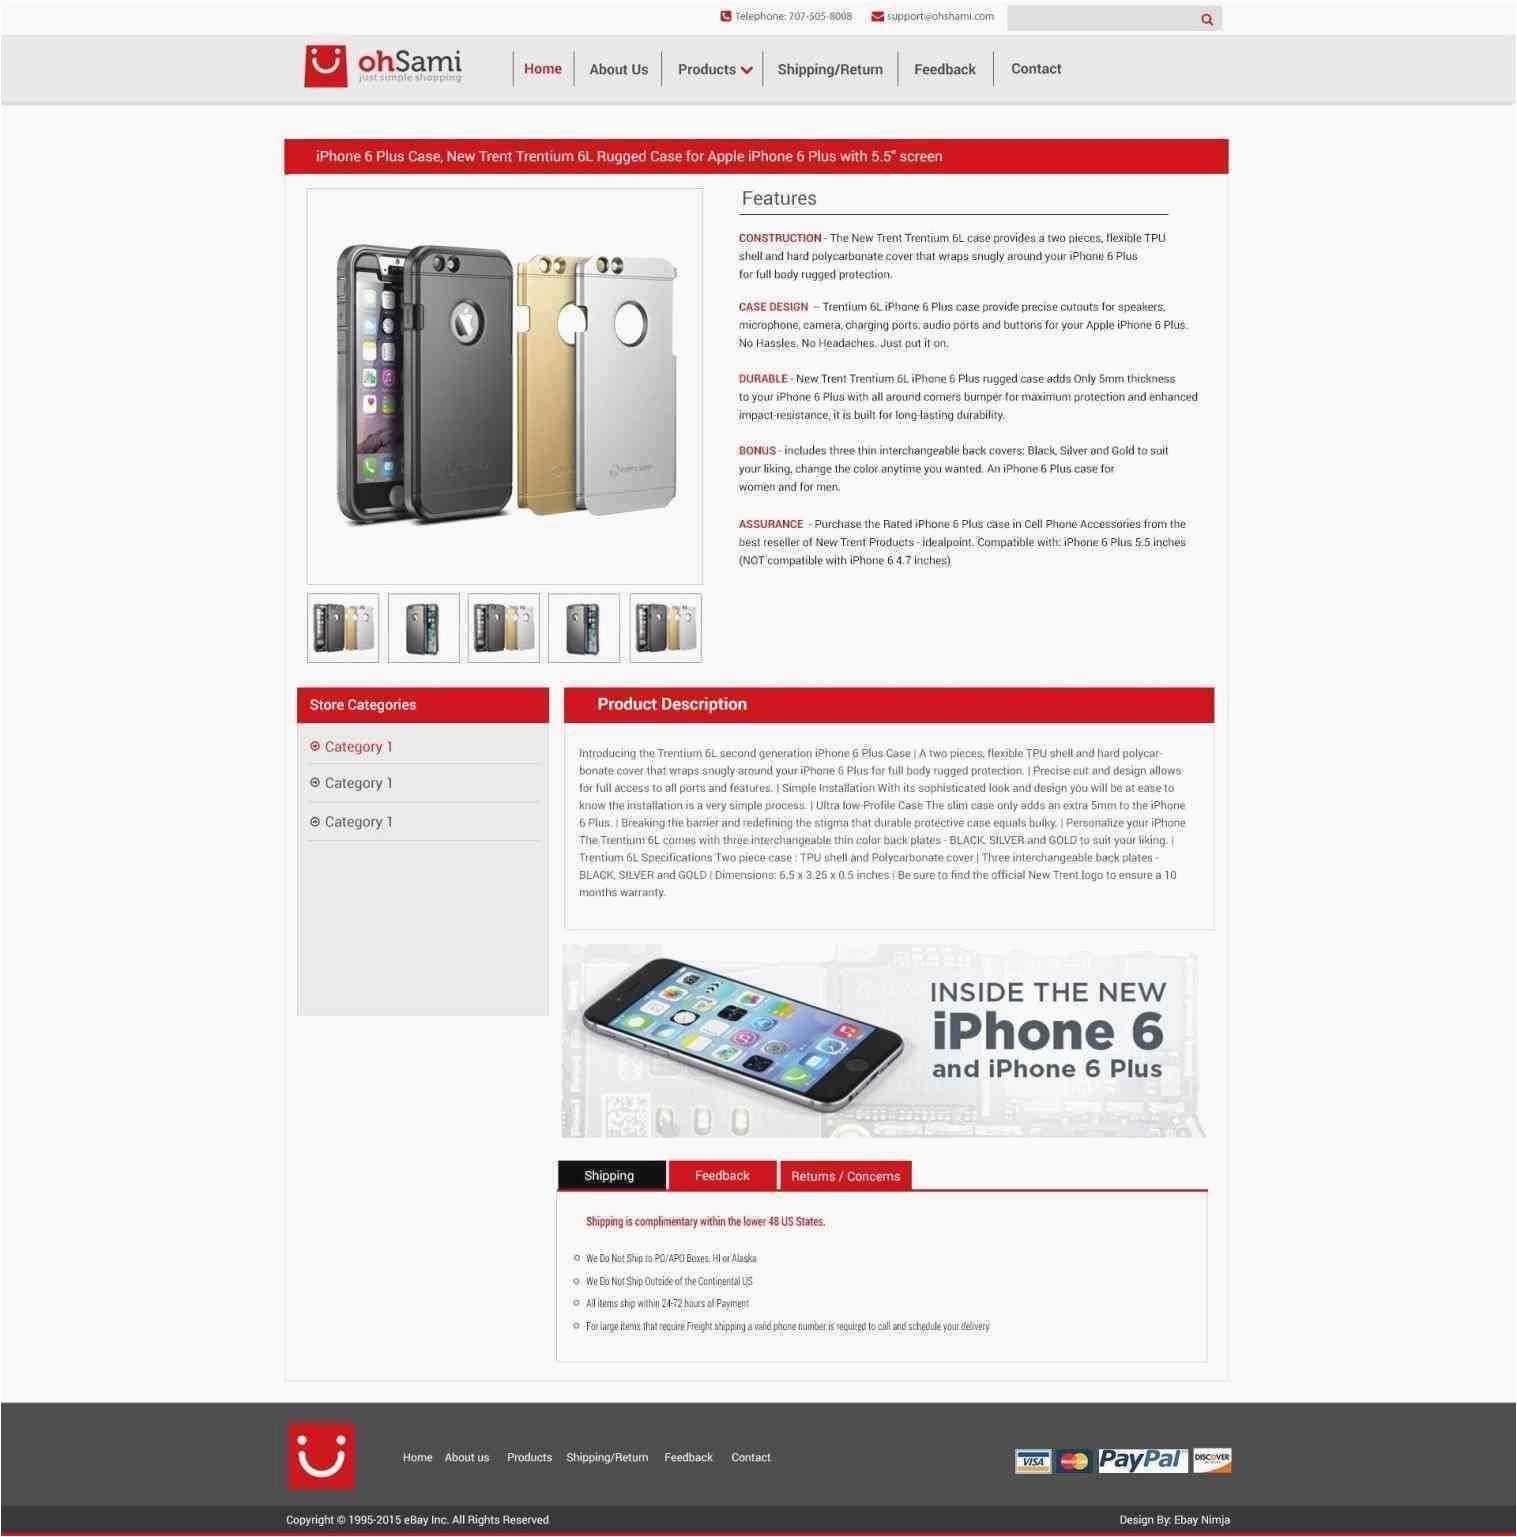 Ebay Storefront Template Beautiful Free Ebay Store Templates Kinoweb org